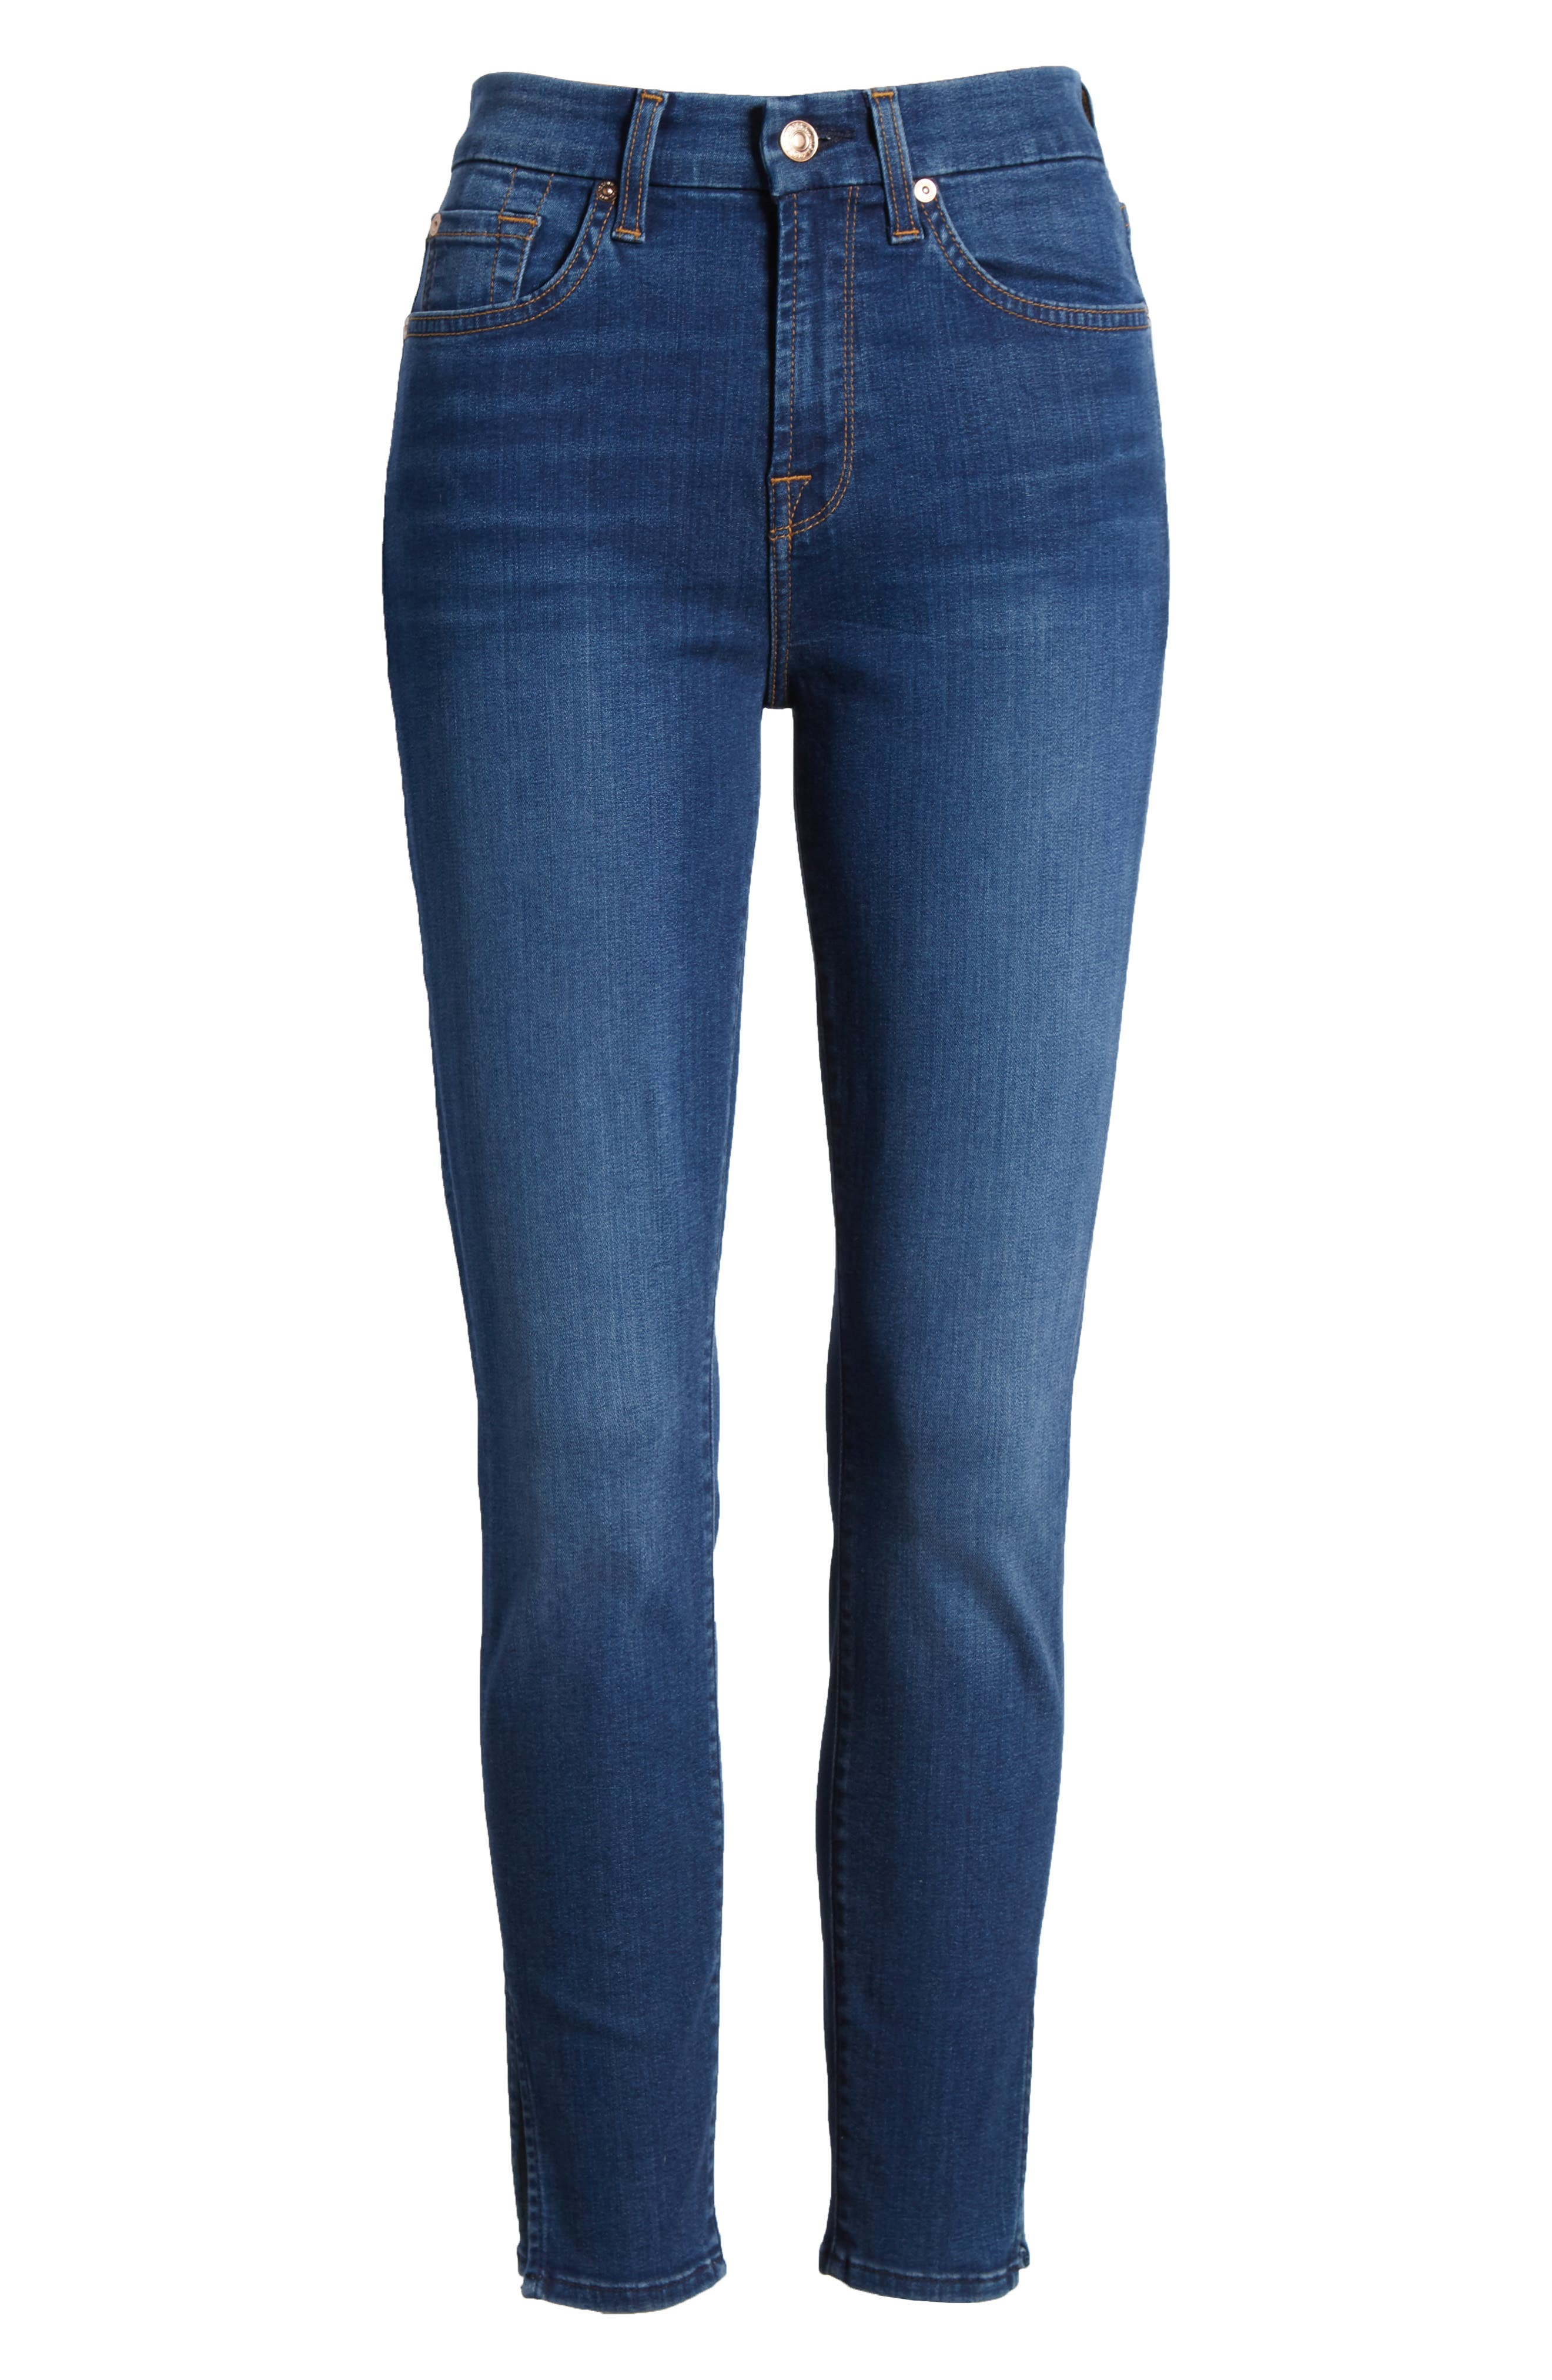 b(air) - Aubrey High Waist Skinny Jeans,                             Alternate thumbnail 7, color,                             Bair Fresh Rinse